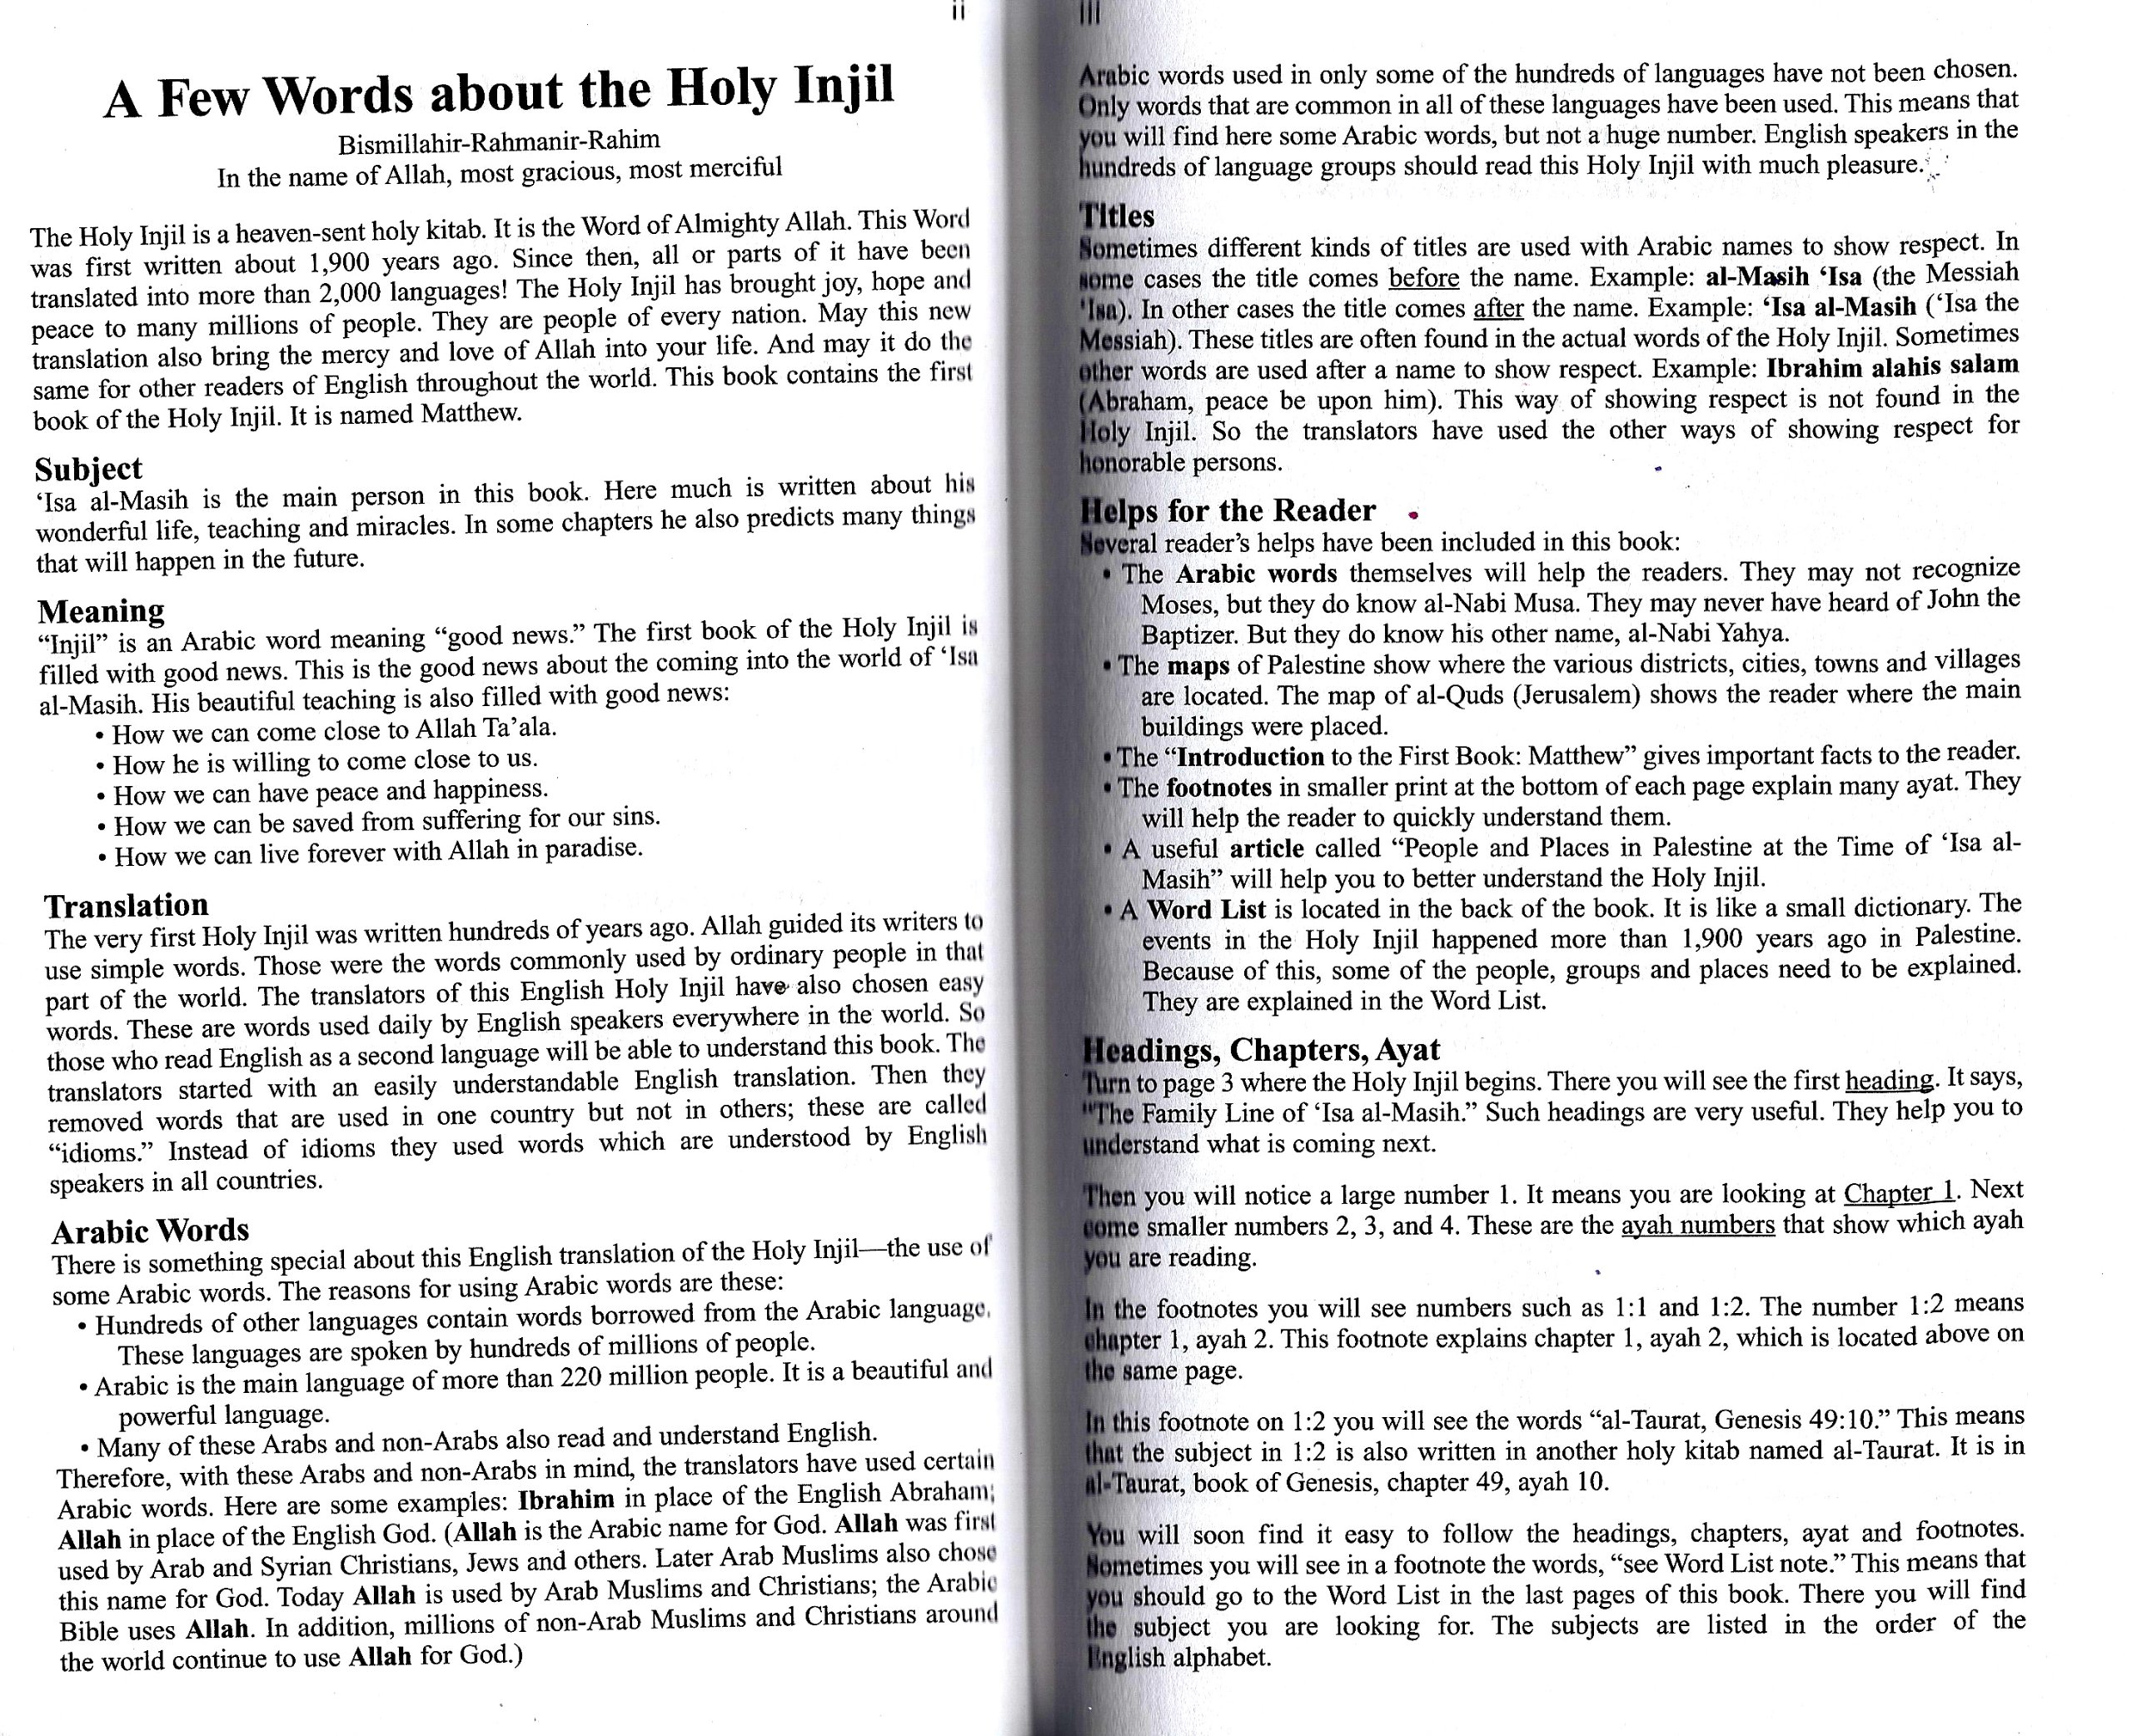 the holy injil first book matthew tajik injil com books